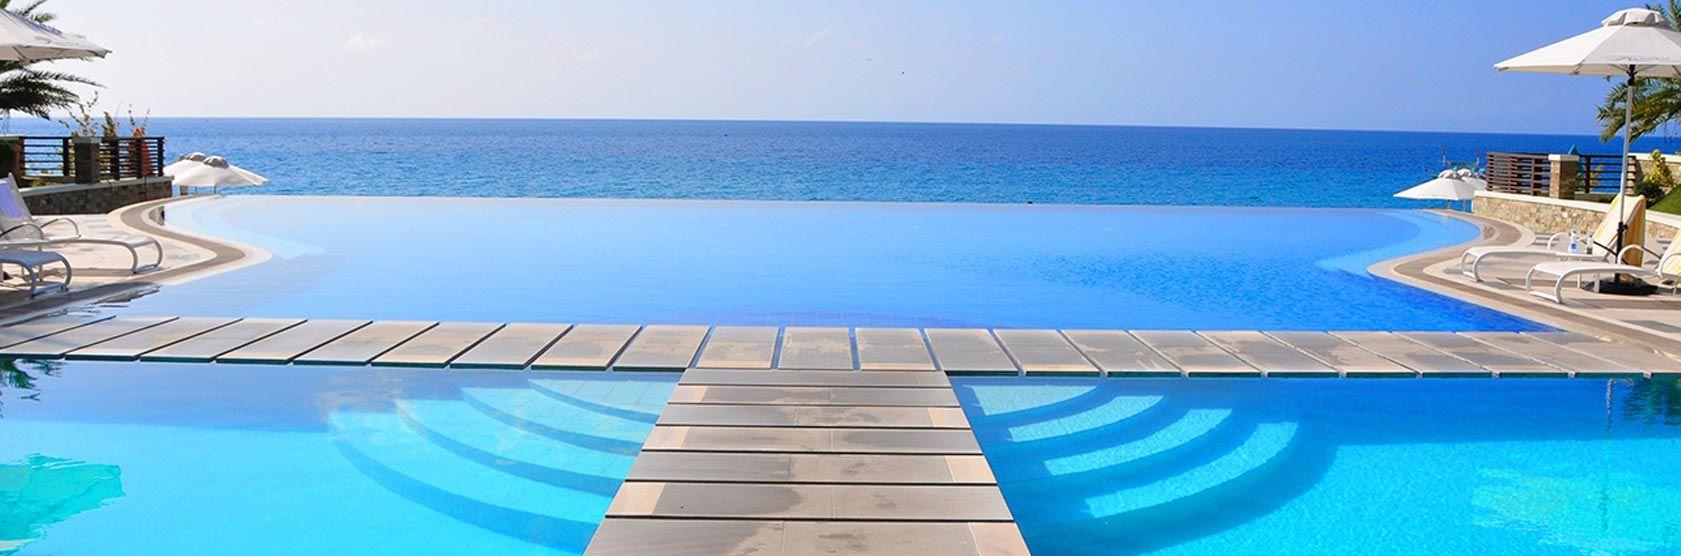 Aruba Real Estate Aruba Rentals Homes in Aruba Aruba